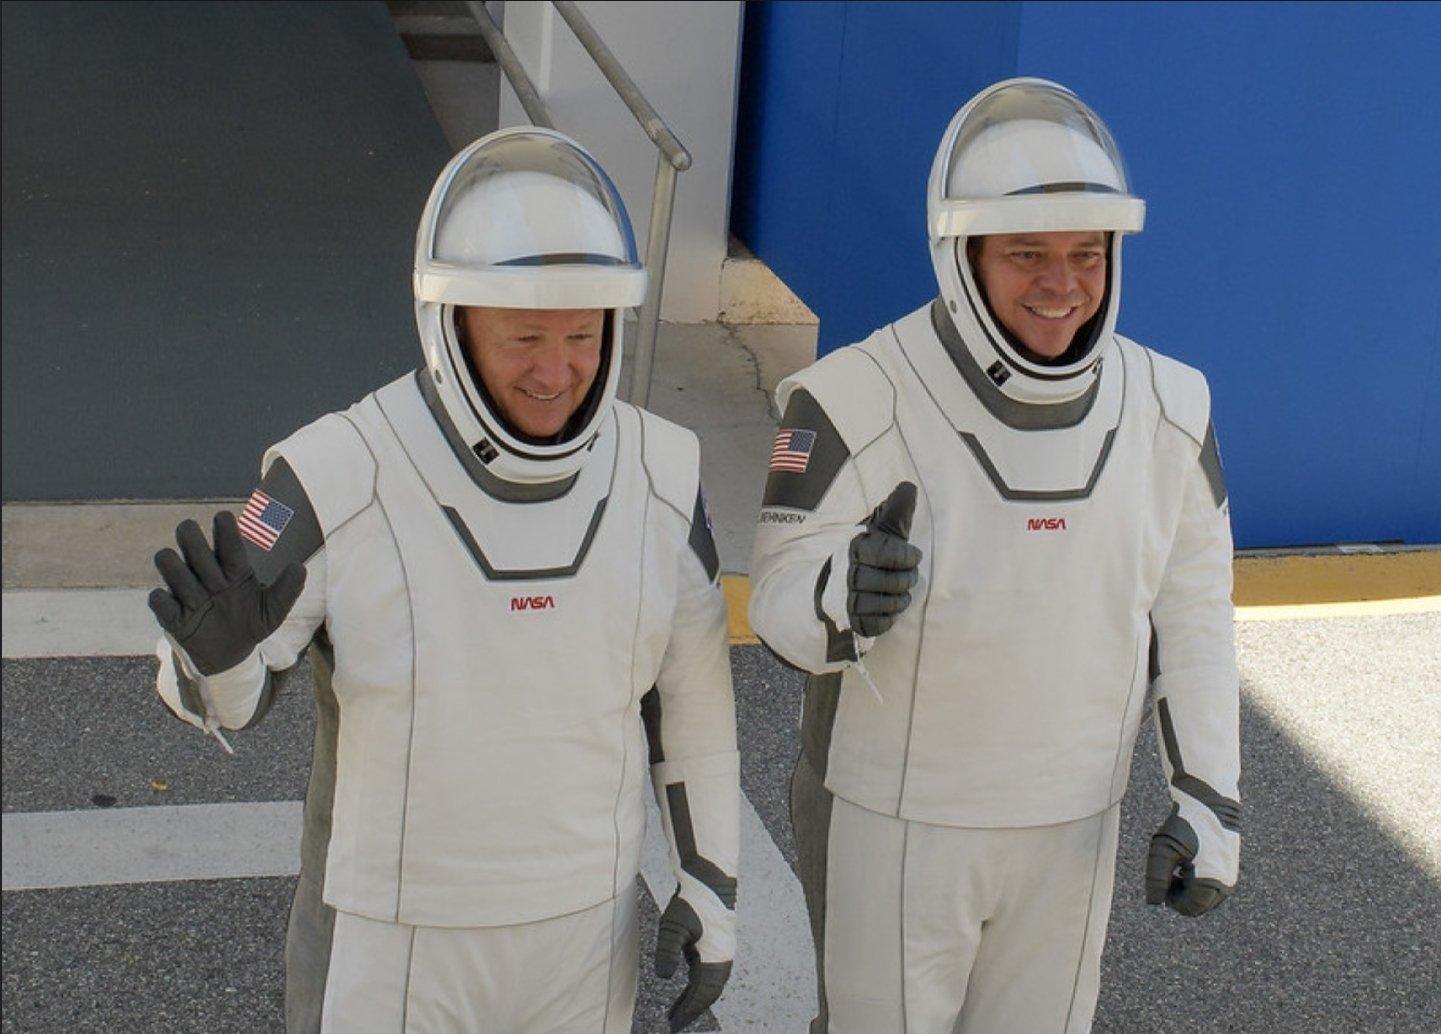 астронавты-испытатели Даг Хёрли и Боб Бенекен